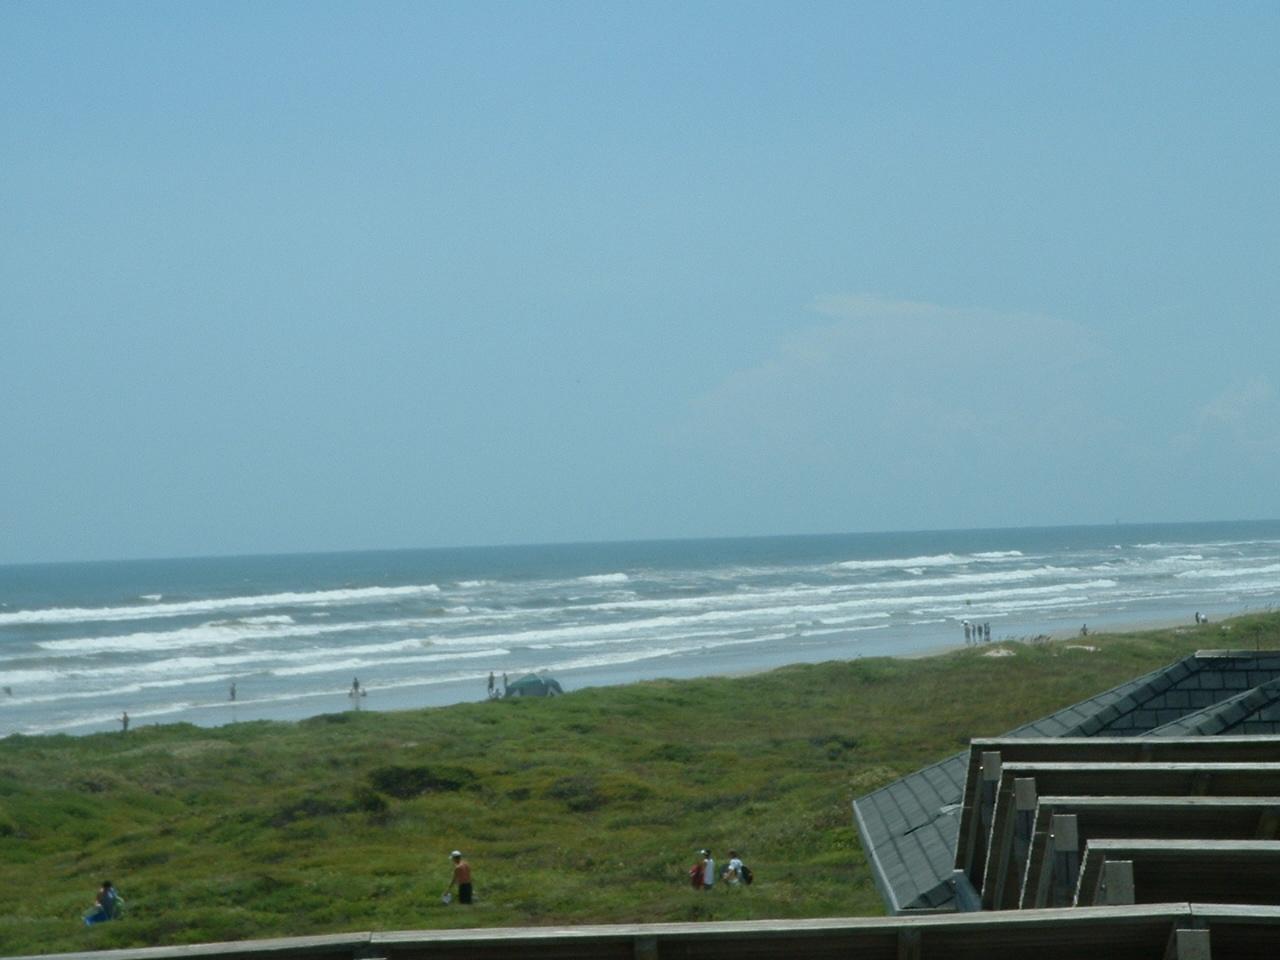 South Padre Island National Seashore